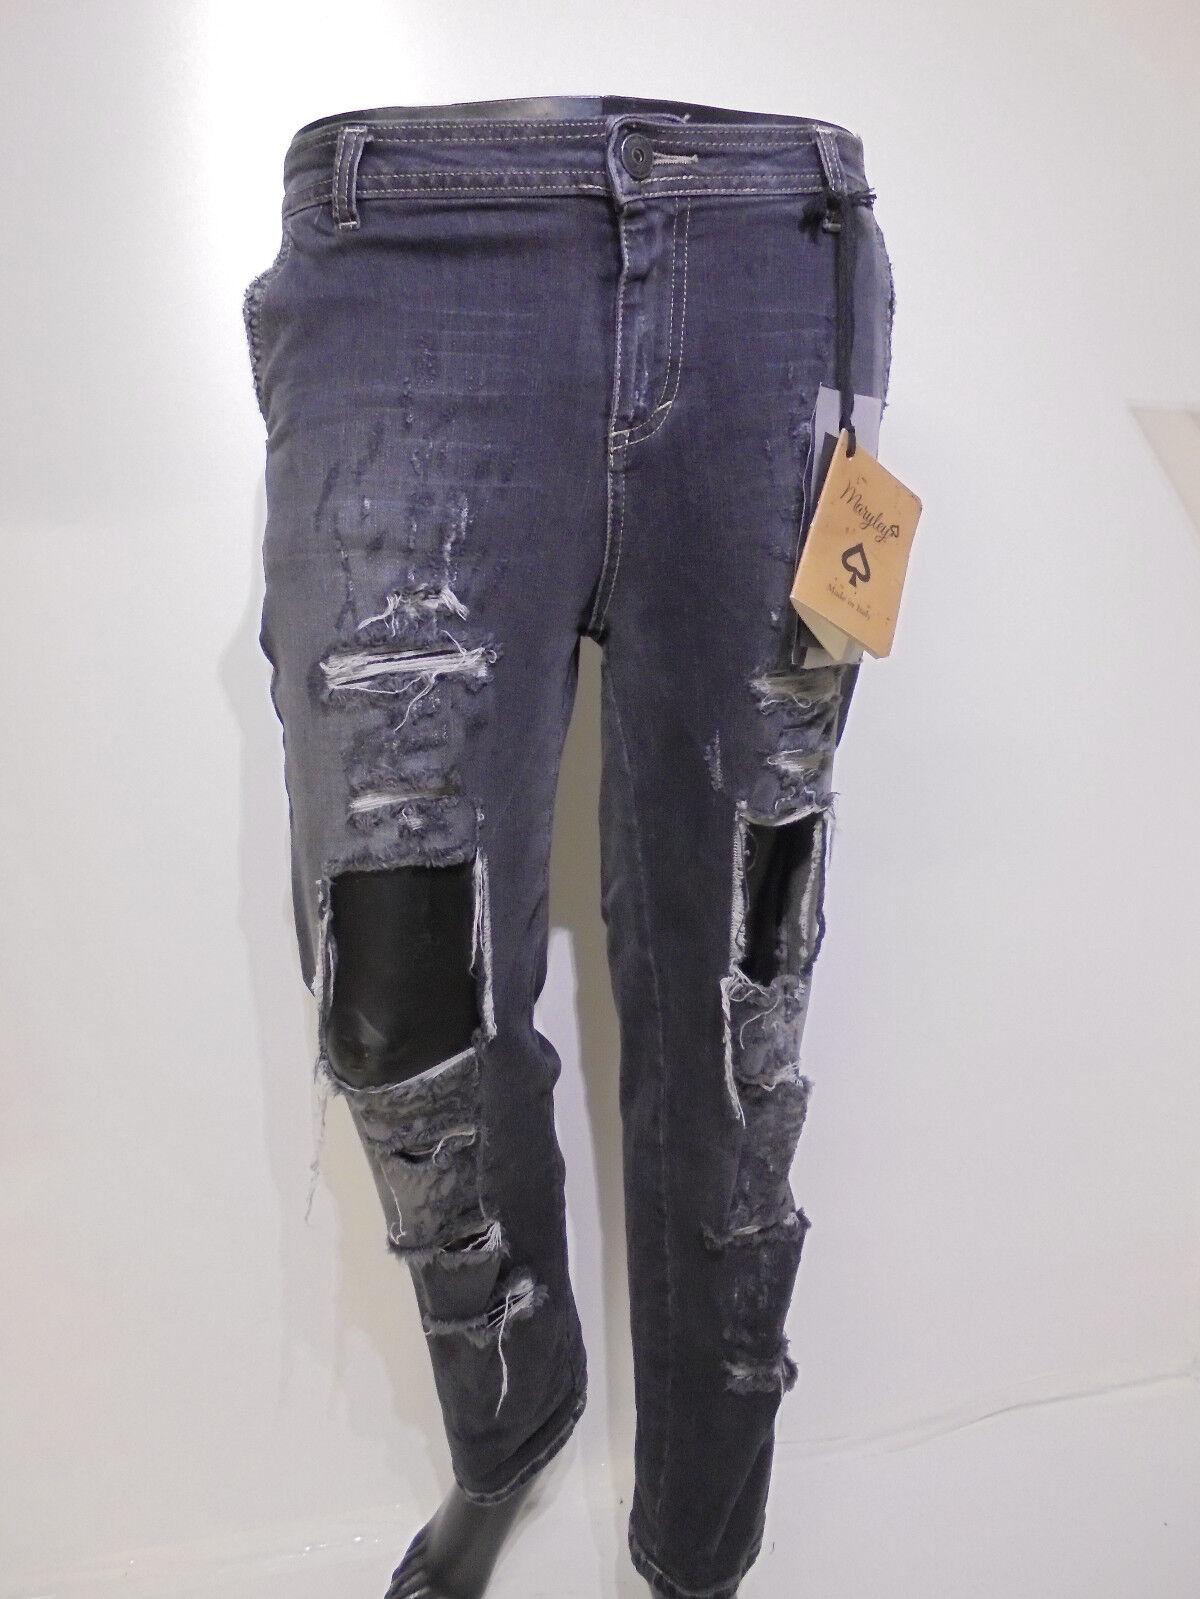 DaMännerJeans Maryley   Hose Frauen Art. B 661 - Rabatt - 75%